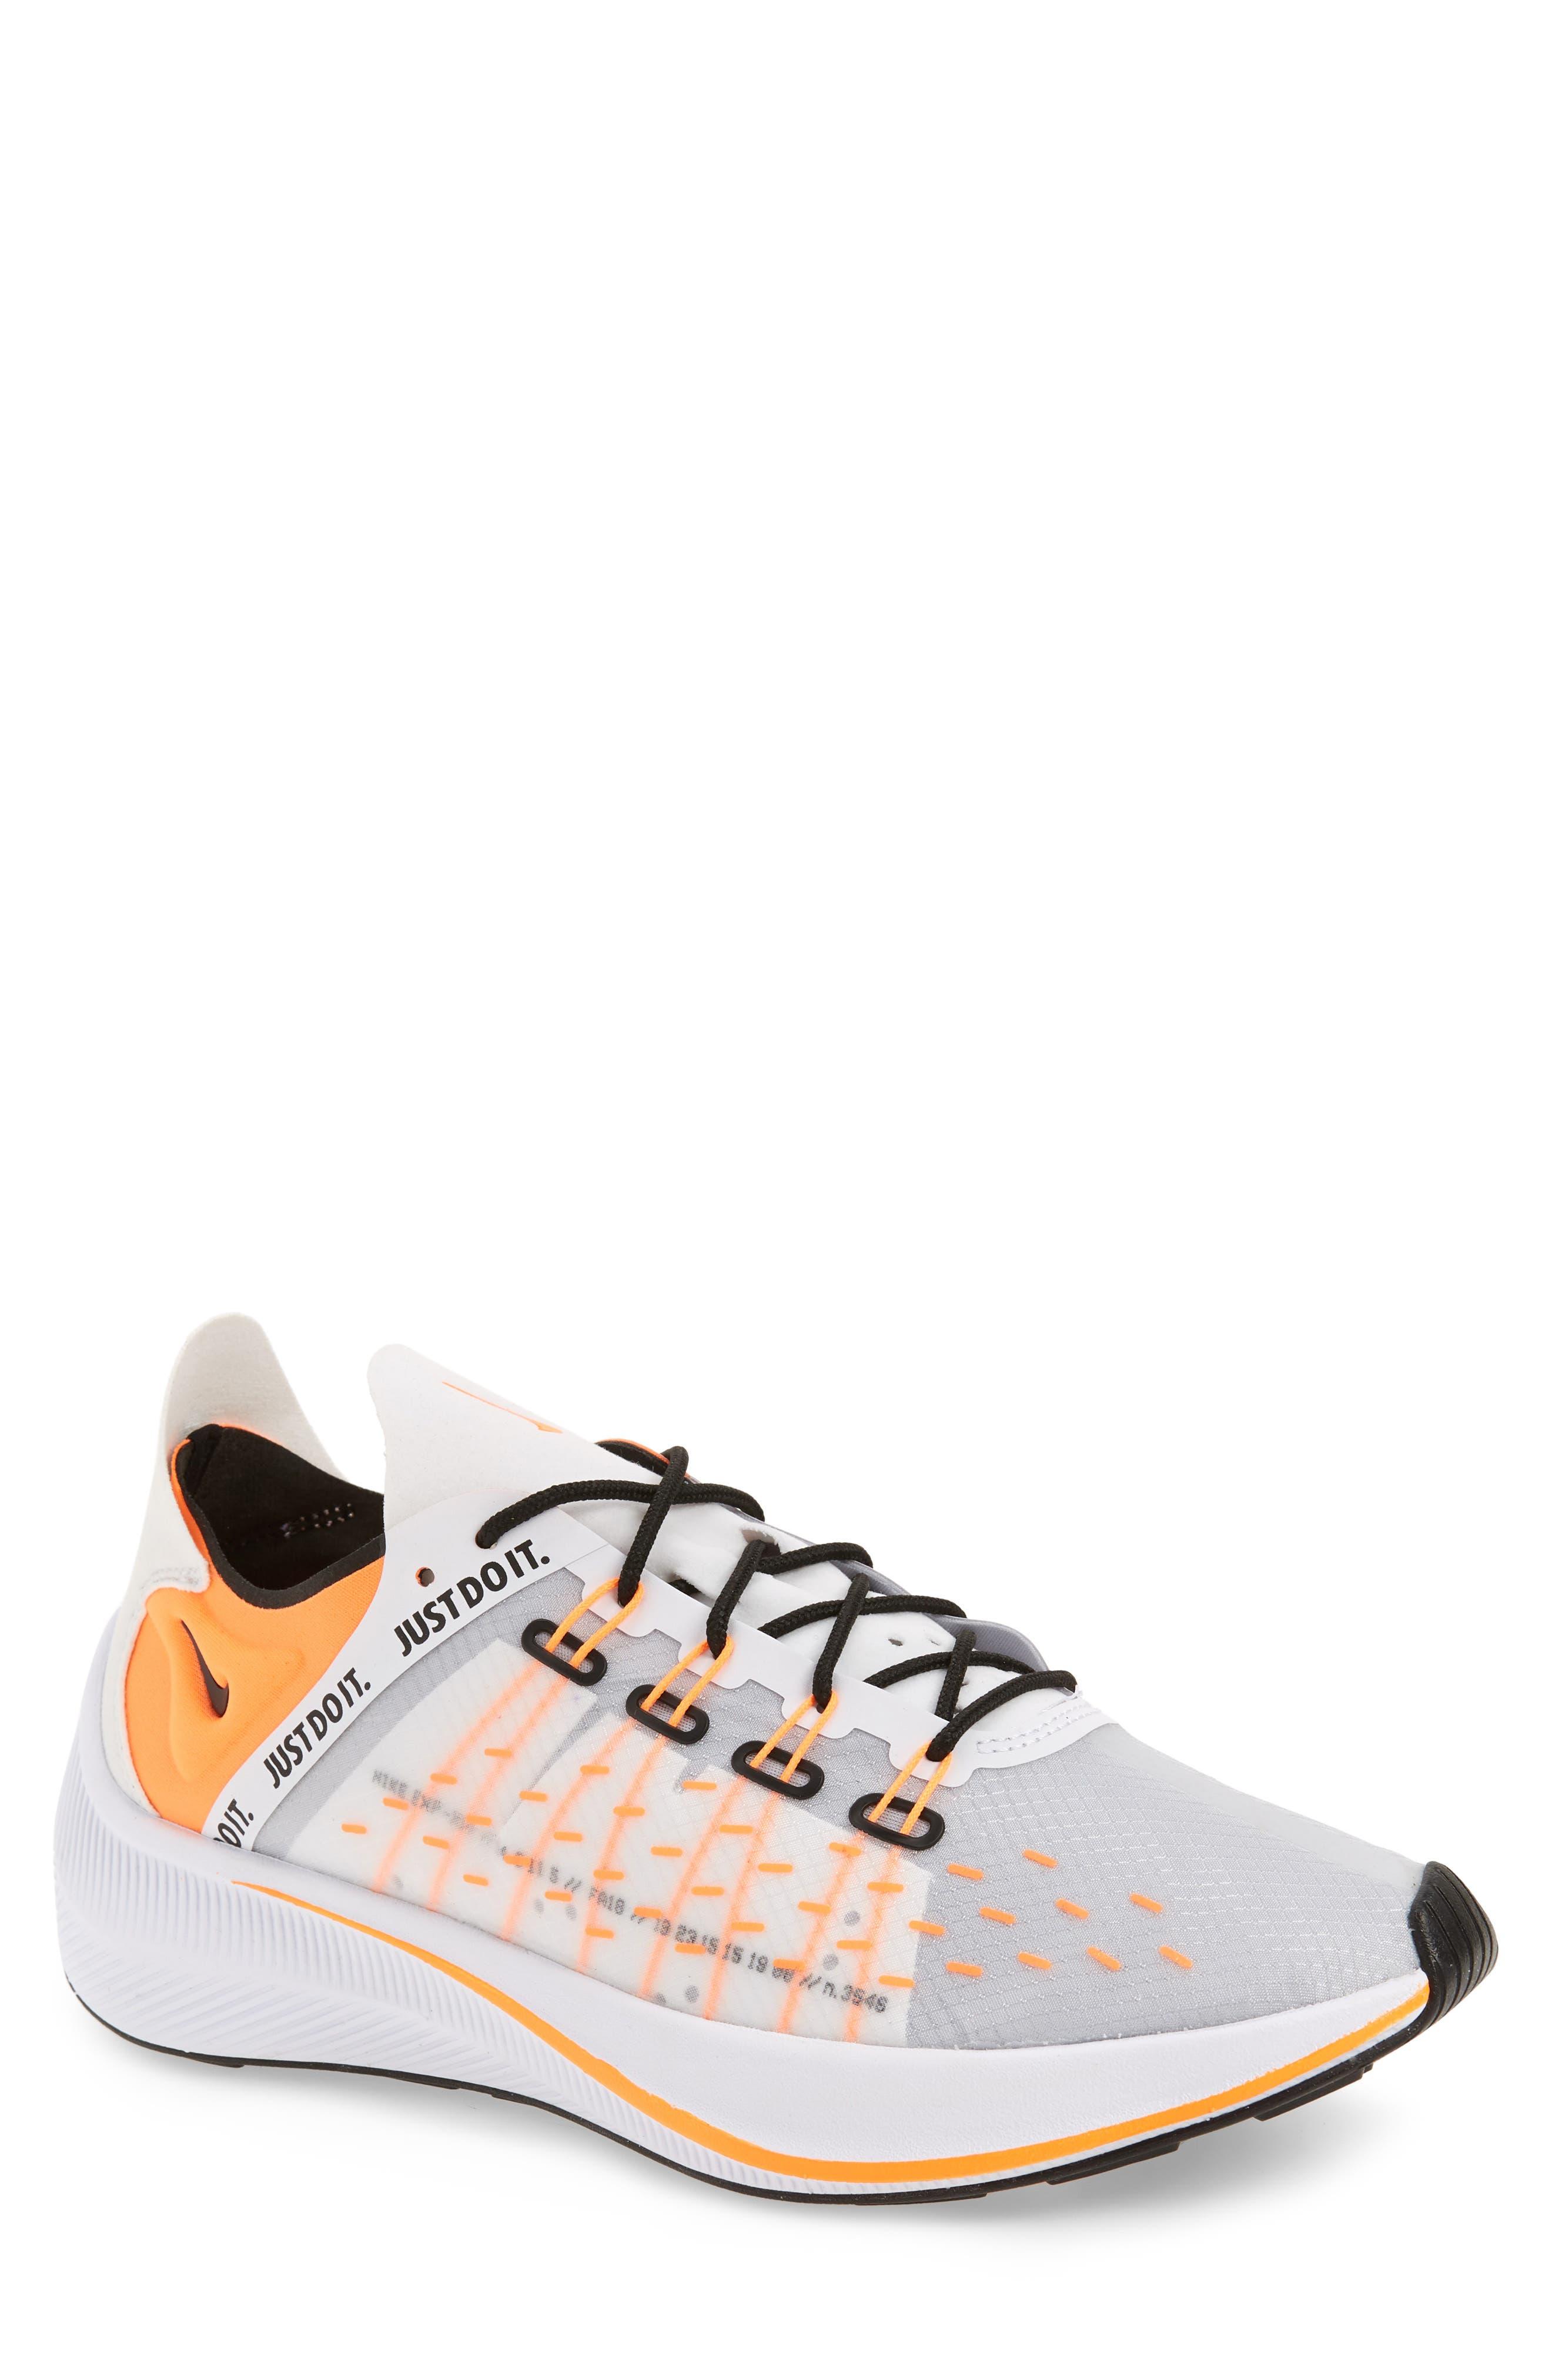 EXP-X14 Just Do It Sneaker,                         Main,                         color, WHITE/ TOTAL ORANGE/ BLACK